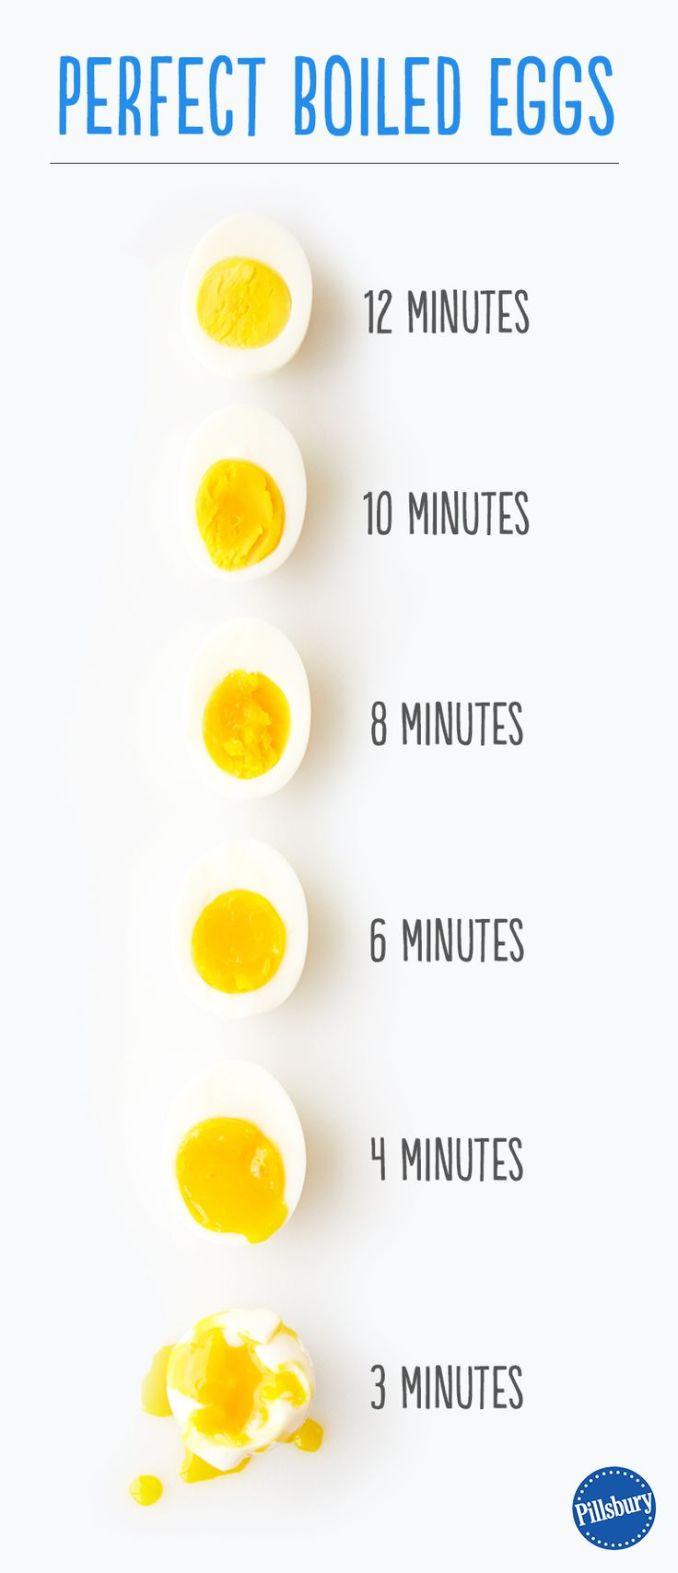 How to Boil Eggs from Pillsbury.com | Food & Recipes